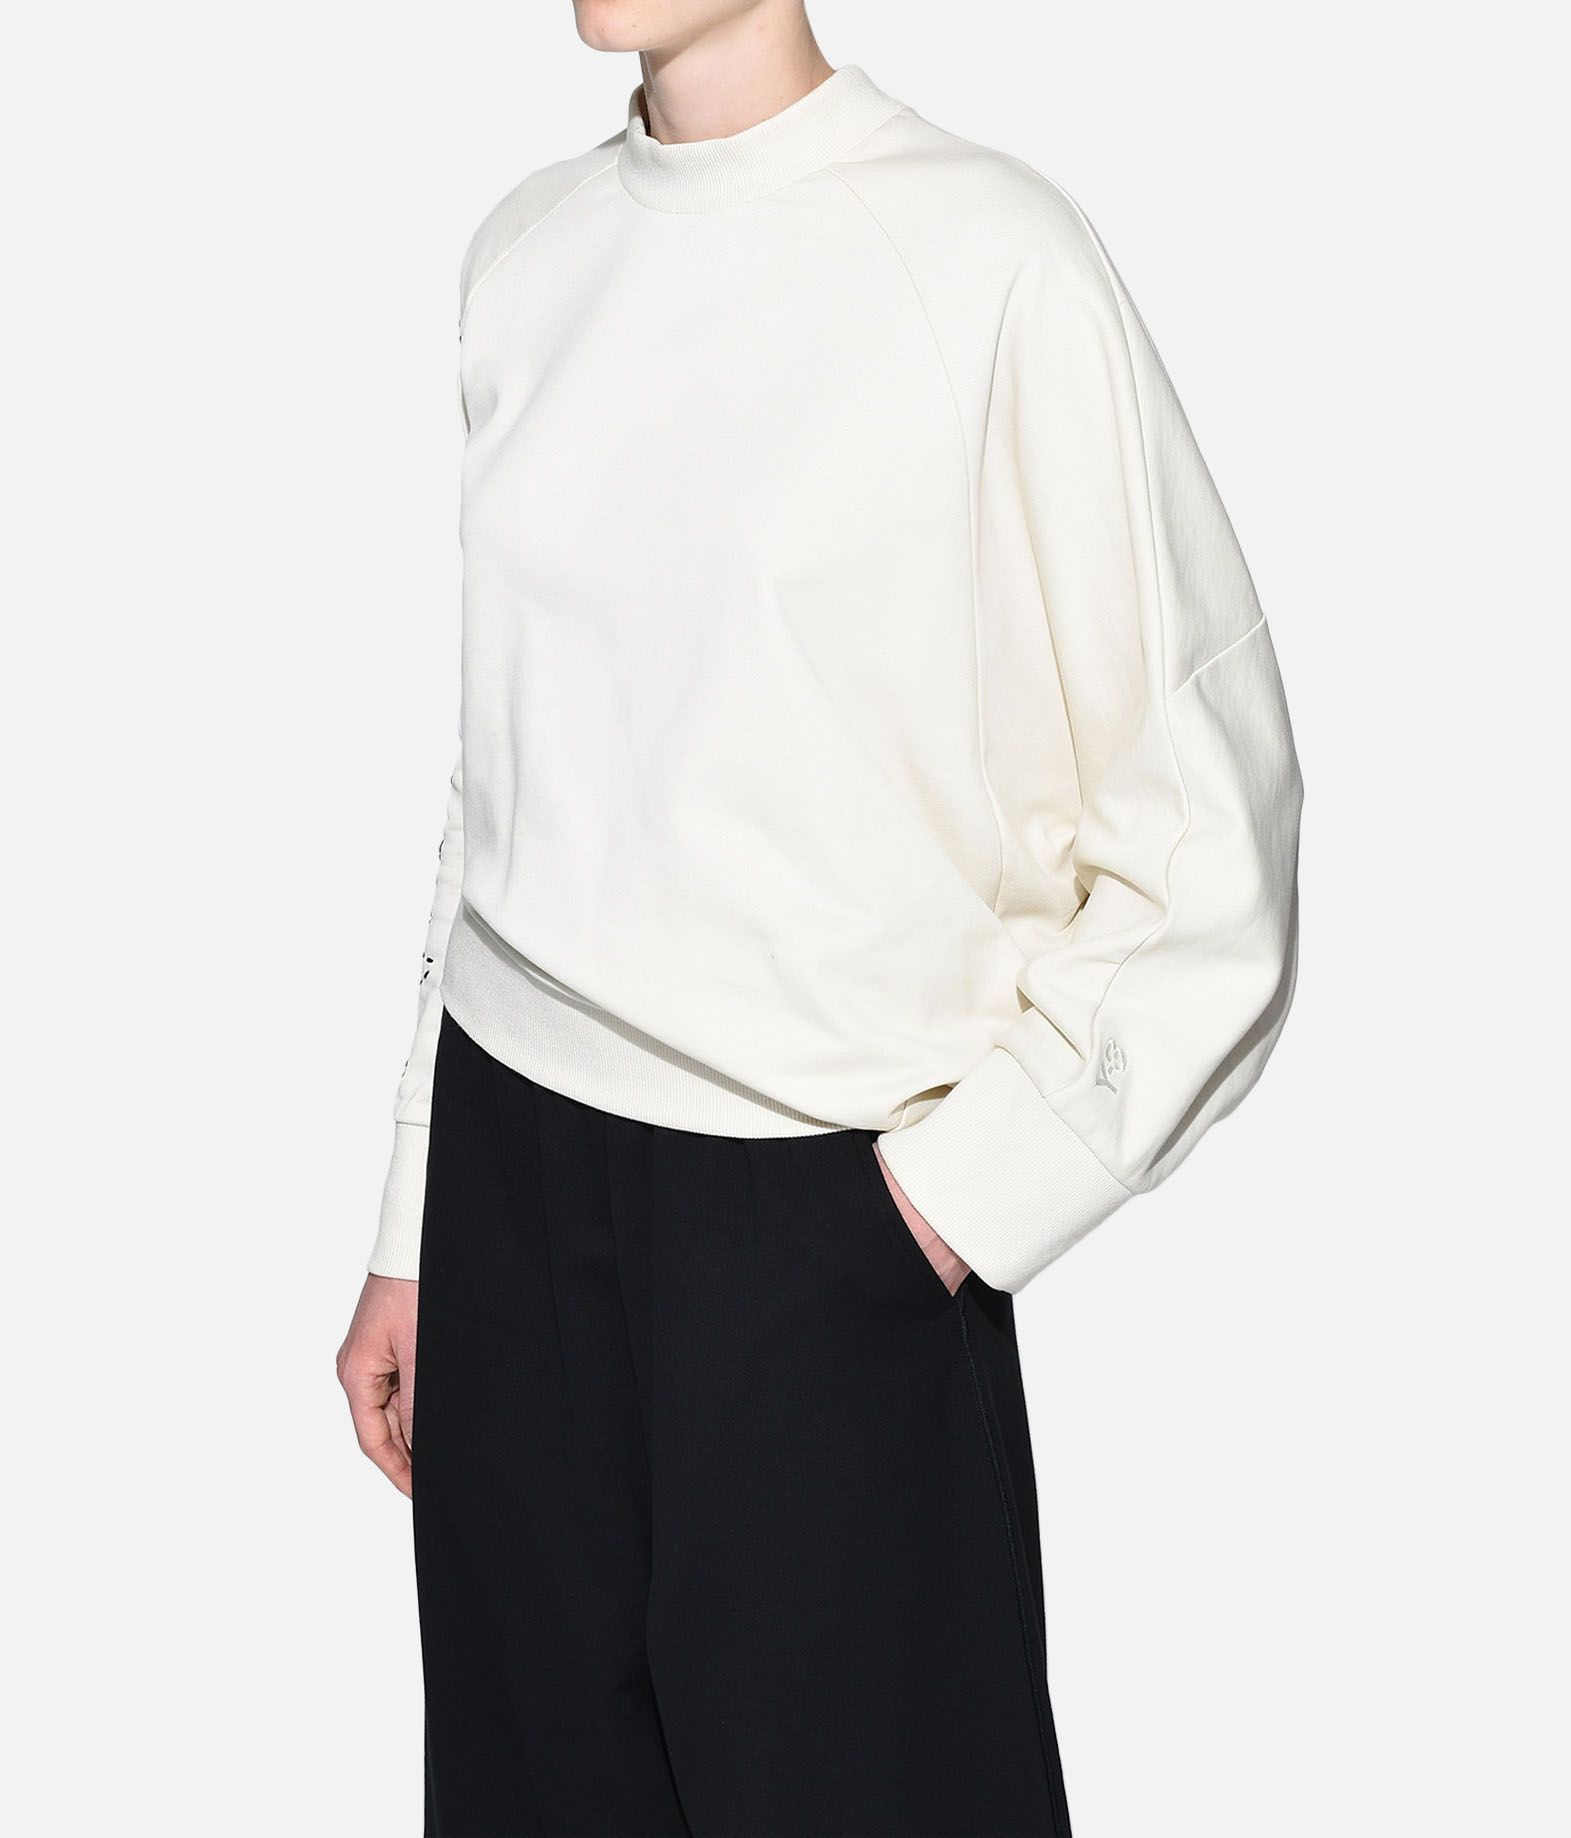 Y-3 Y-3 Sashiko Slogan Sweater Sweatshirt Damen e